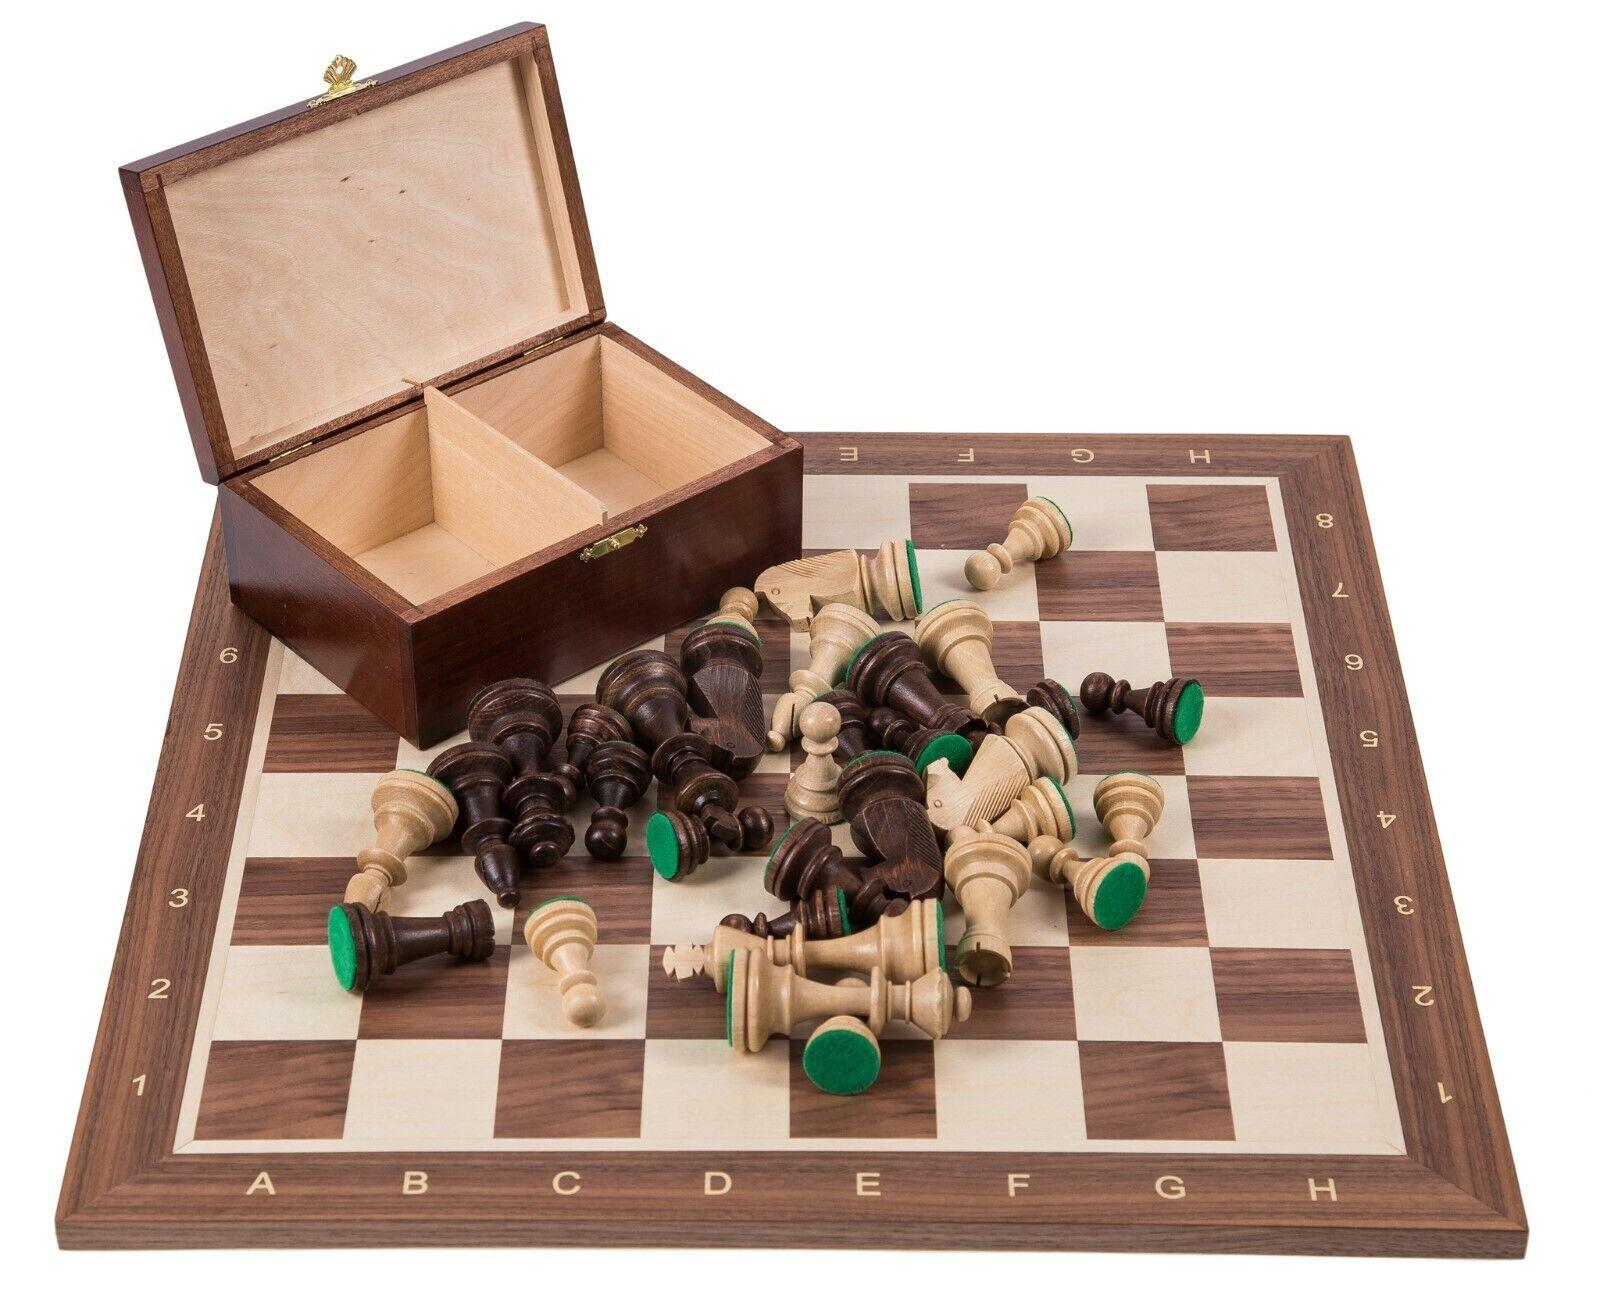 SQUARE - Pro Wooden Chess Set No. 6 - ITALIA  - Chessboard - Walnut wood